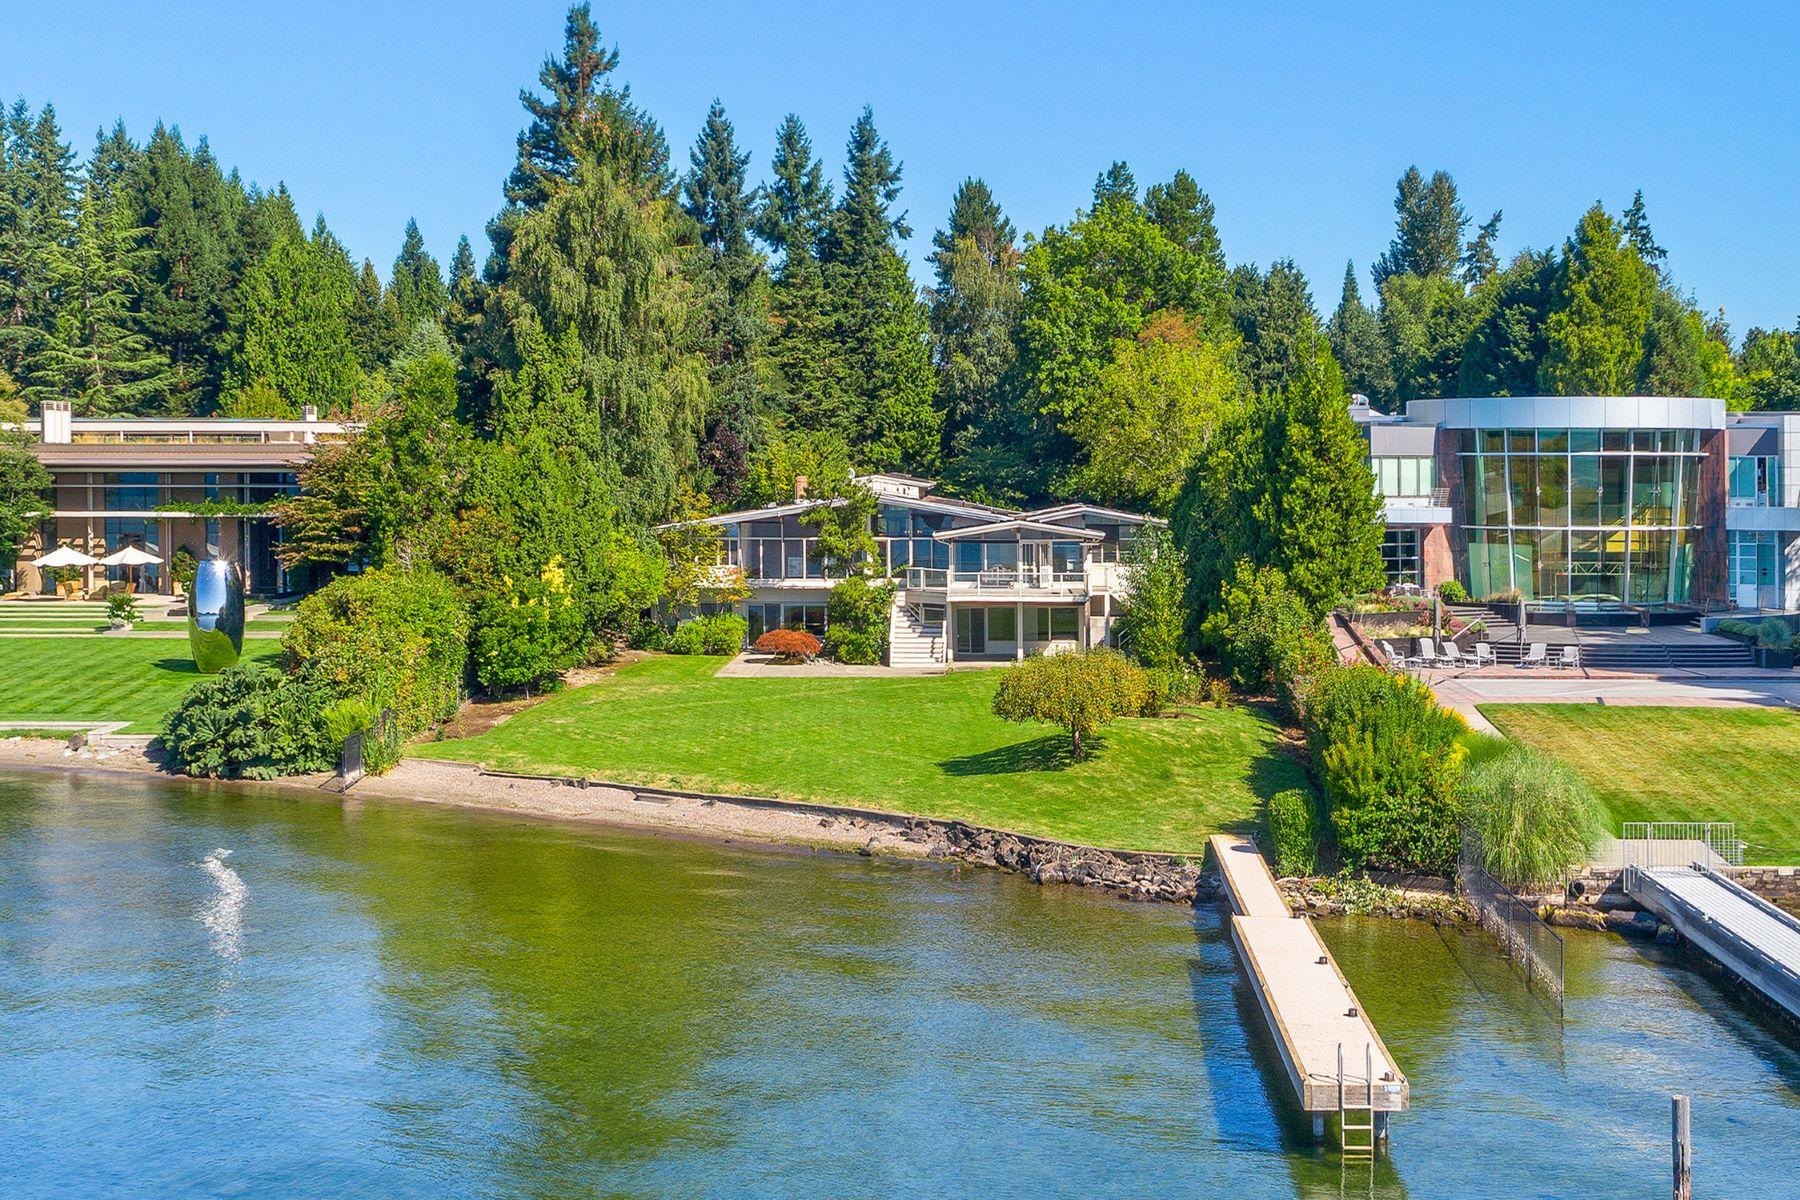 Additional photo for property listing at Medina's Gold Coast 7935 Overlake Dr. W 麦地那市, 华盛顿州 98039 美国